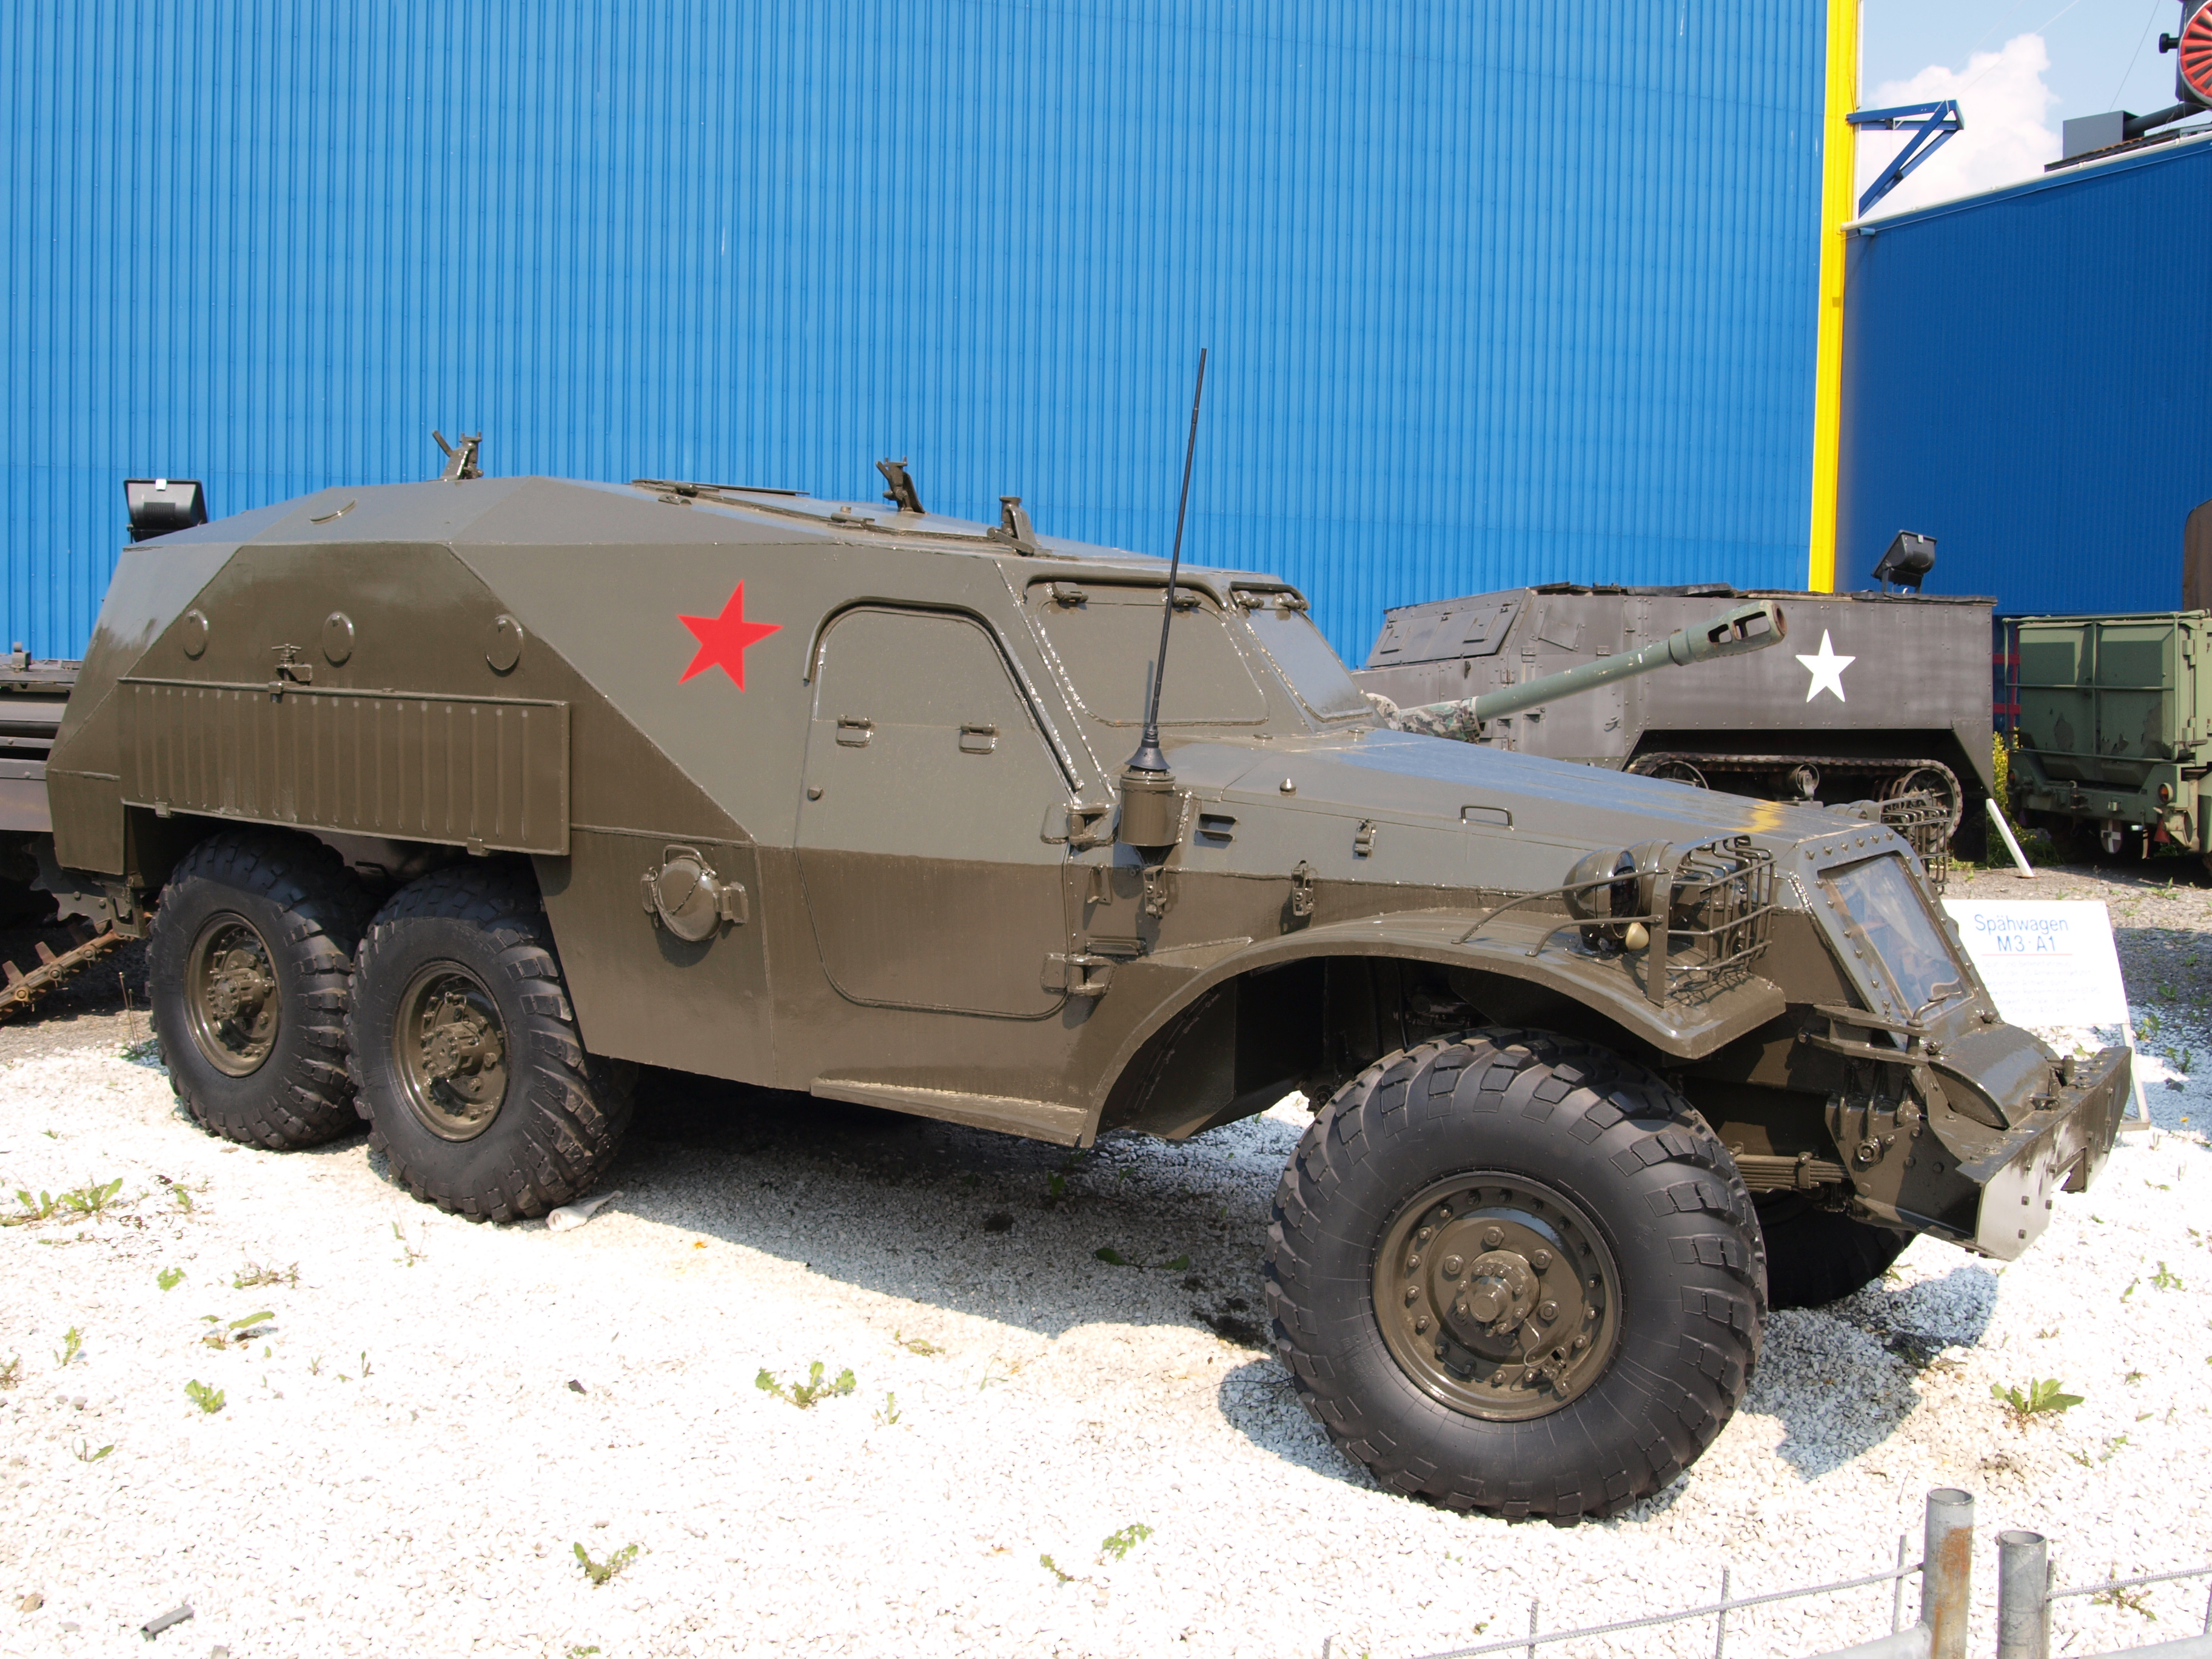 https://upload.wikimedia.org/wikipedia/commons/2/28/BTR-152_armoured_transporterr_at_Sinsheim.JPG